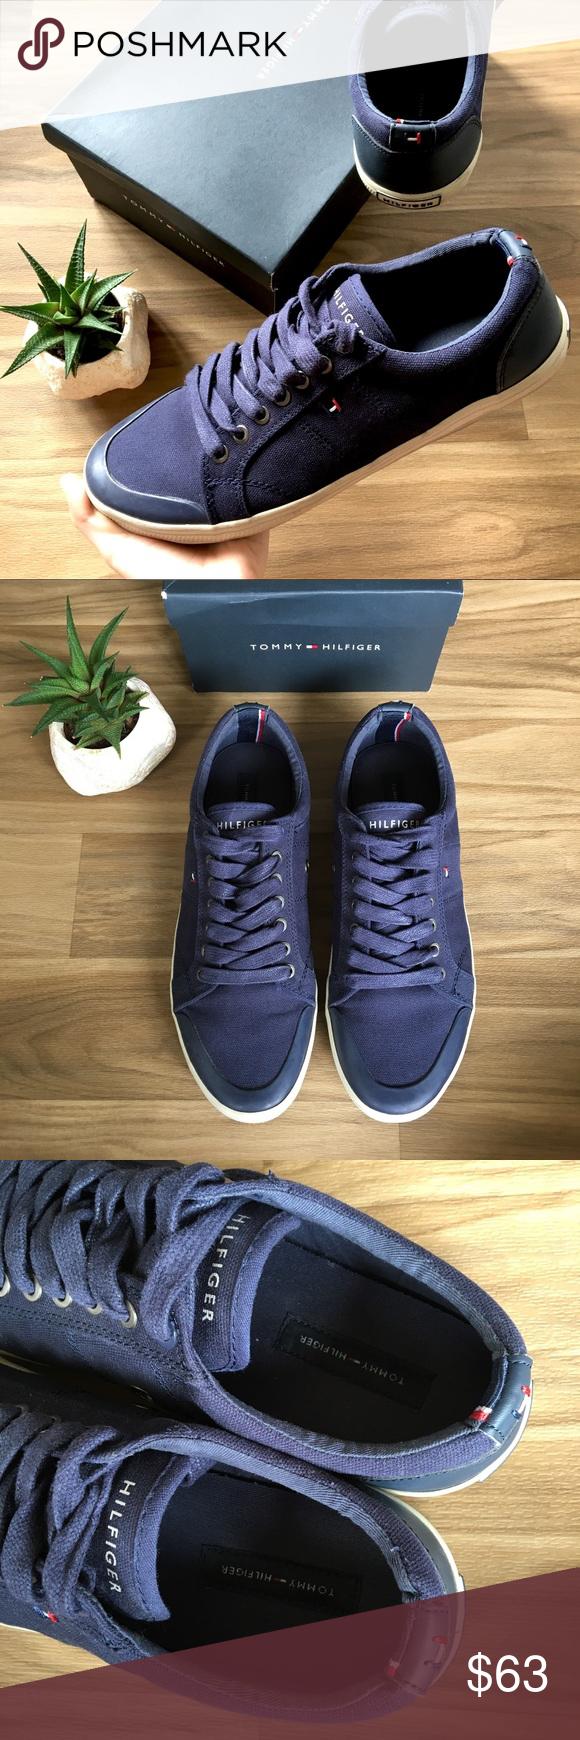 b39c6cd8e9f211 TOMMY HILFIGER 🇳🇱 Men s Canvas Sneakers Tennis Navy blue sneakers by TOMMY  HILFIGER! ♢